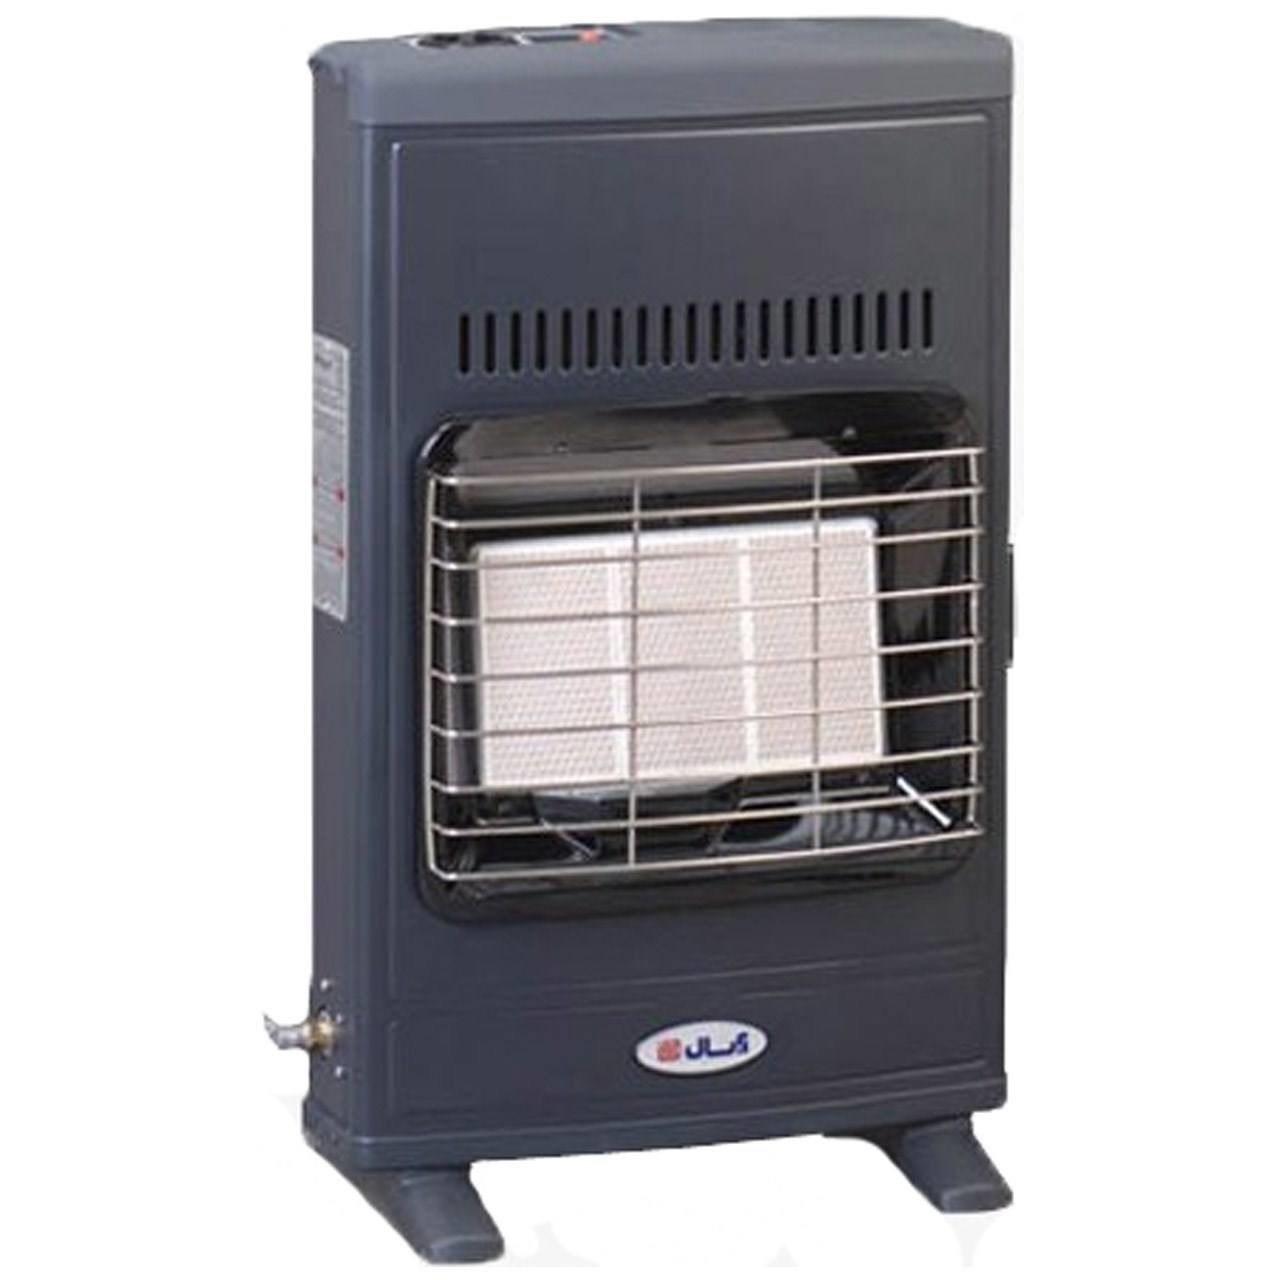 بخاری گازی آبسال مدل 438LPG   Absal 438LPG Gas Heater